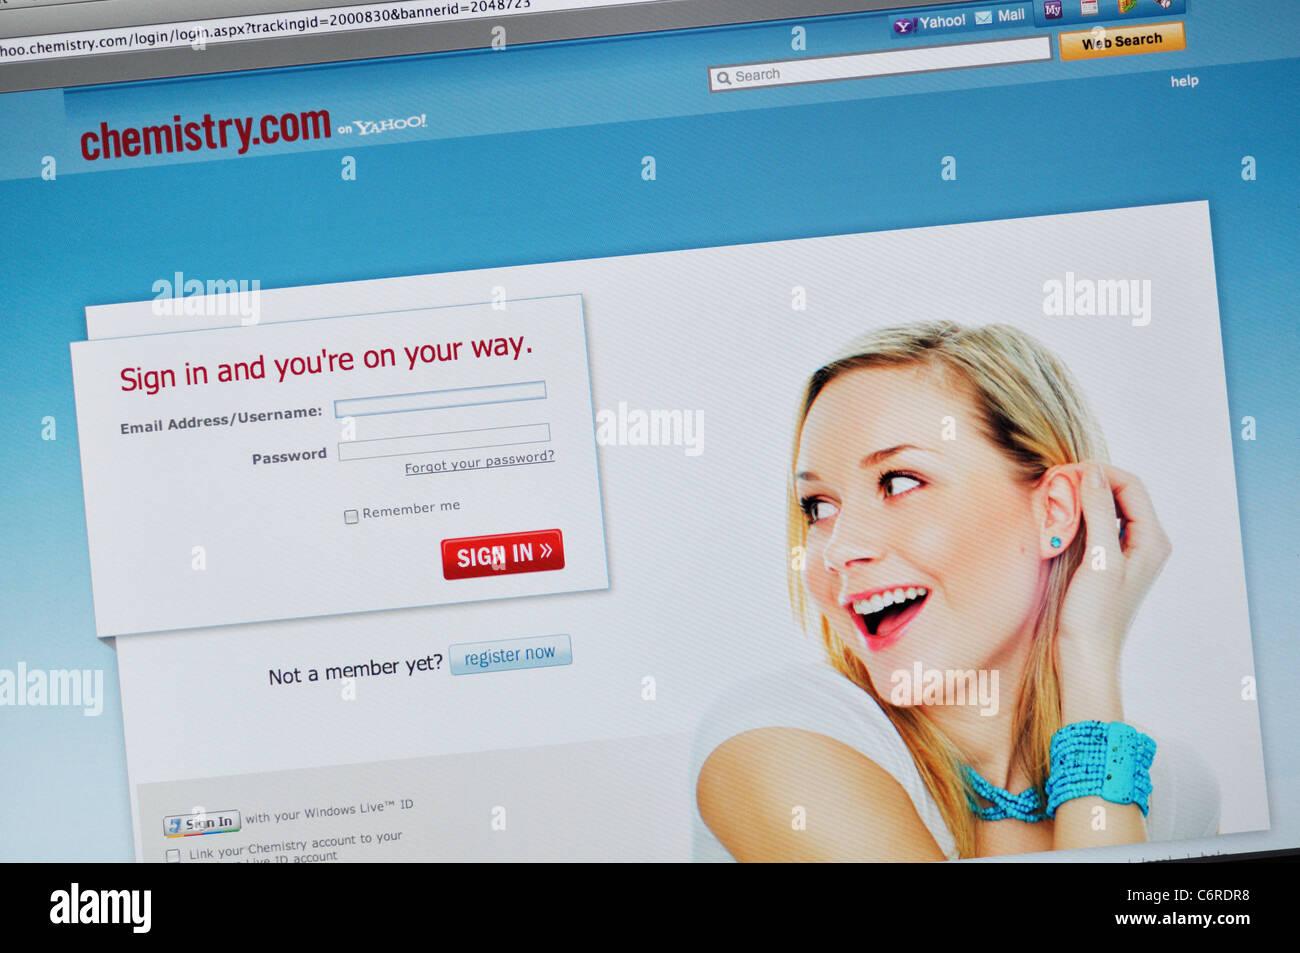 chemistry online dating